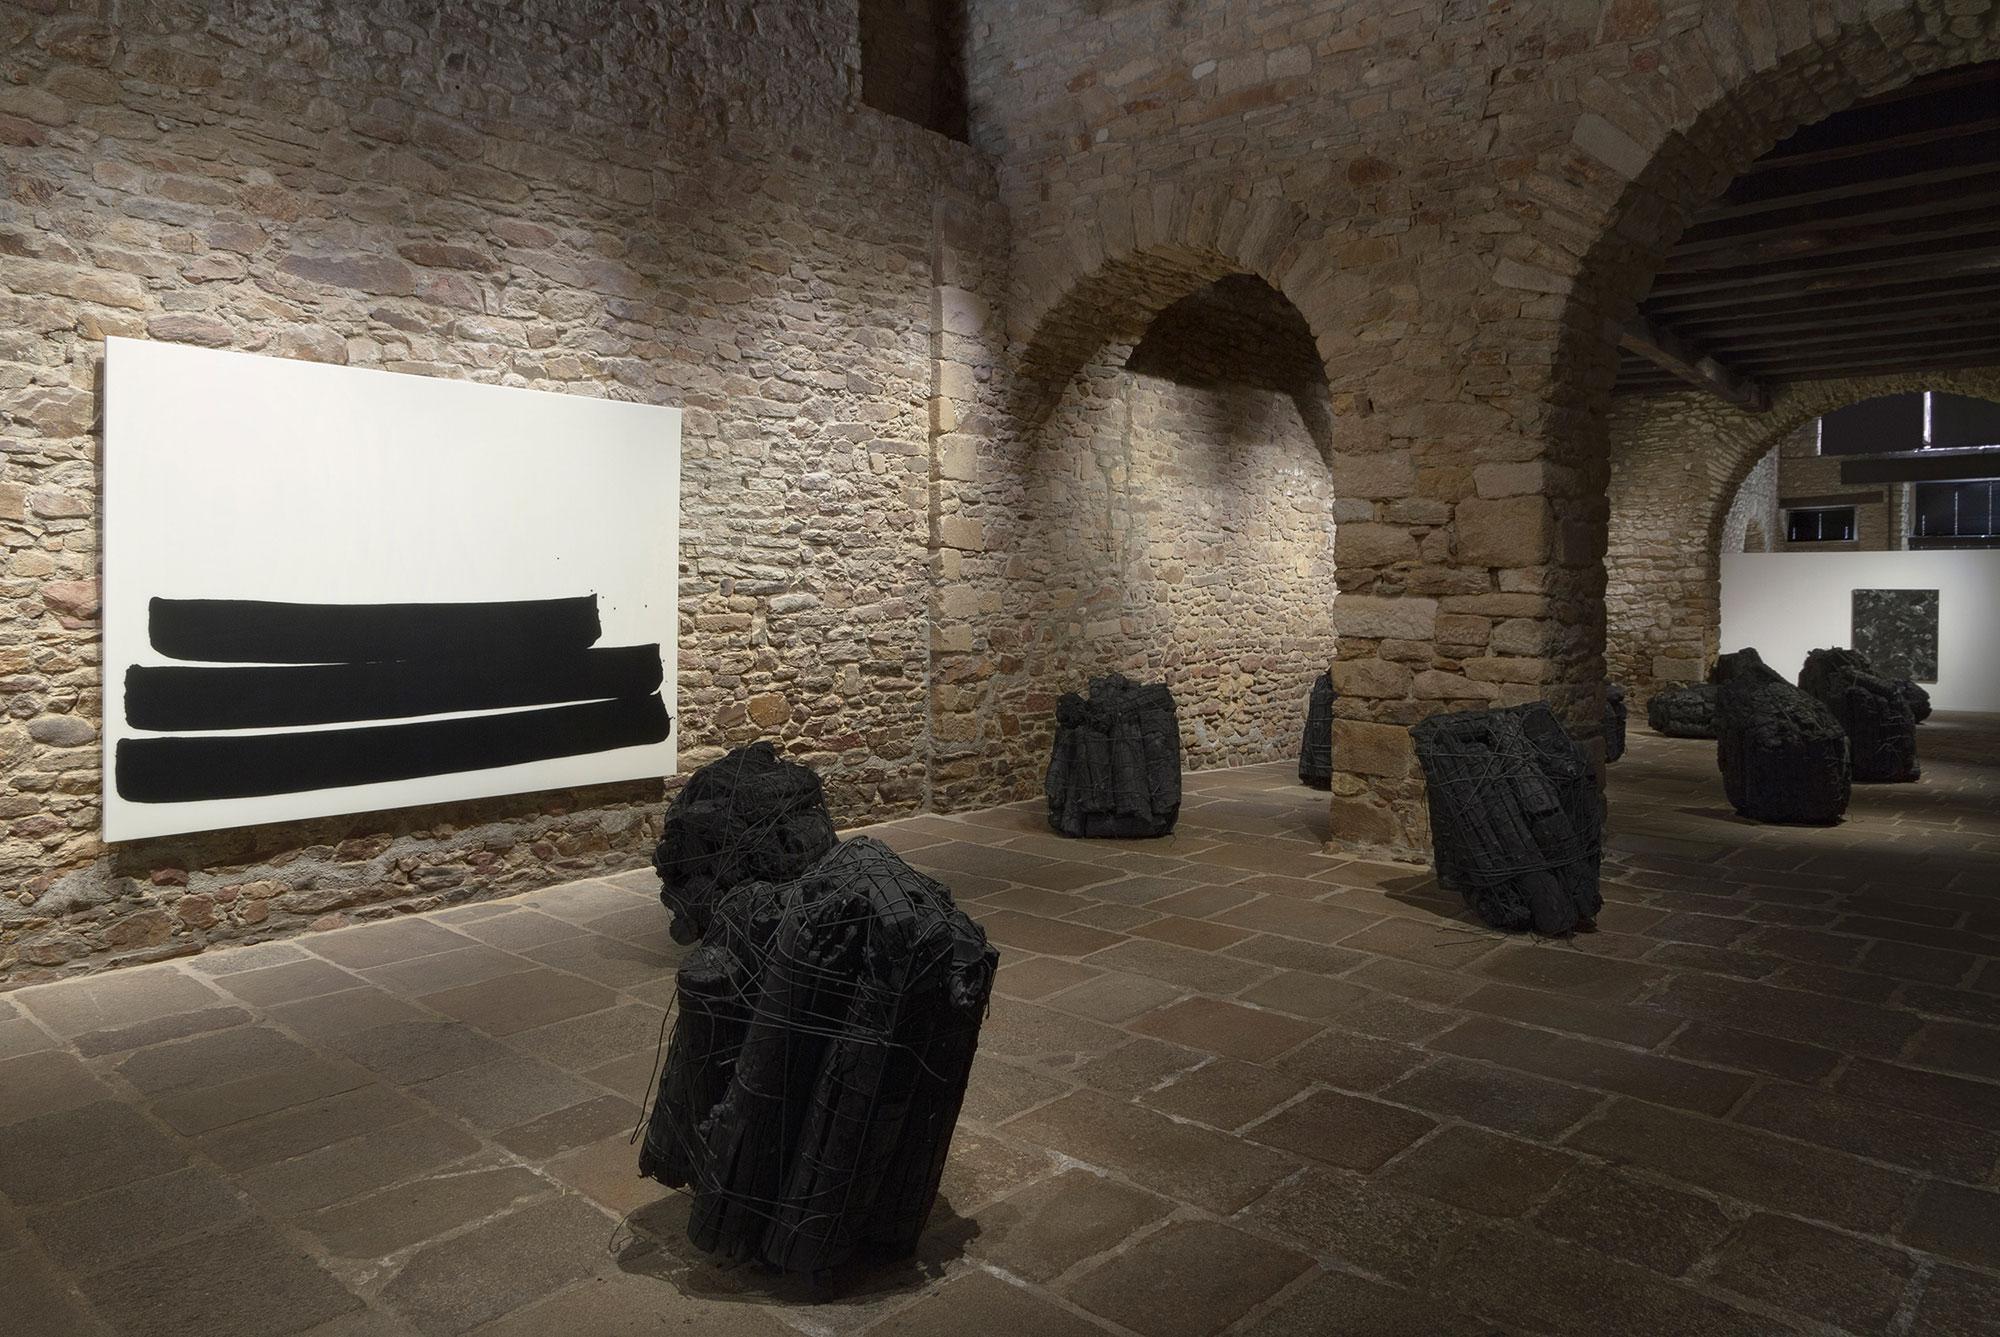 Issu du feu, Charcoal with rubber band, 100 x 90 x 90 cm (each-about), Installation view, Musee des Beaux-Arts de Vannes, 2016